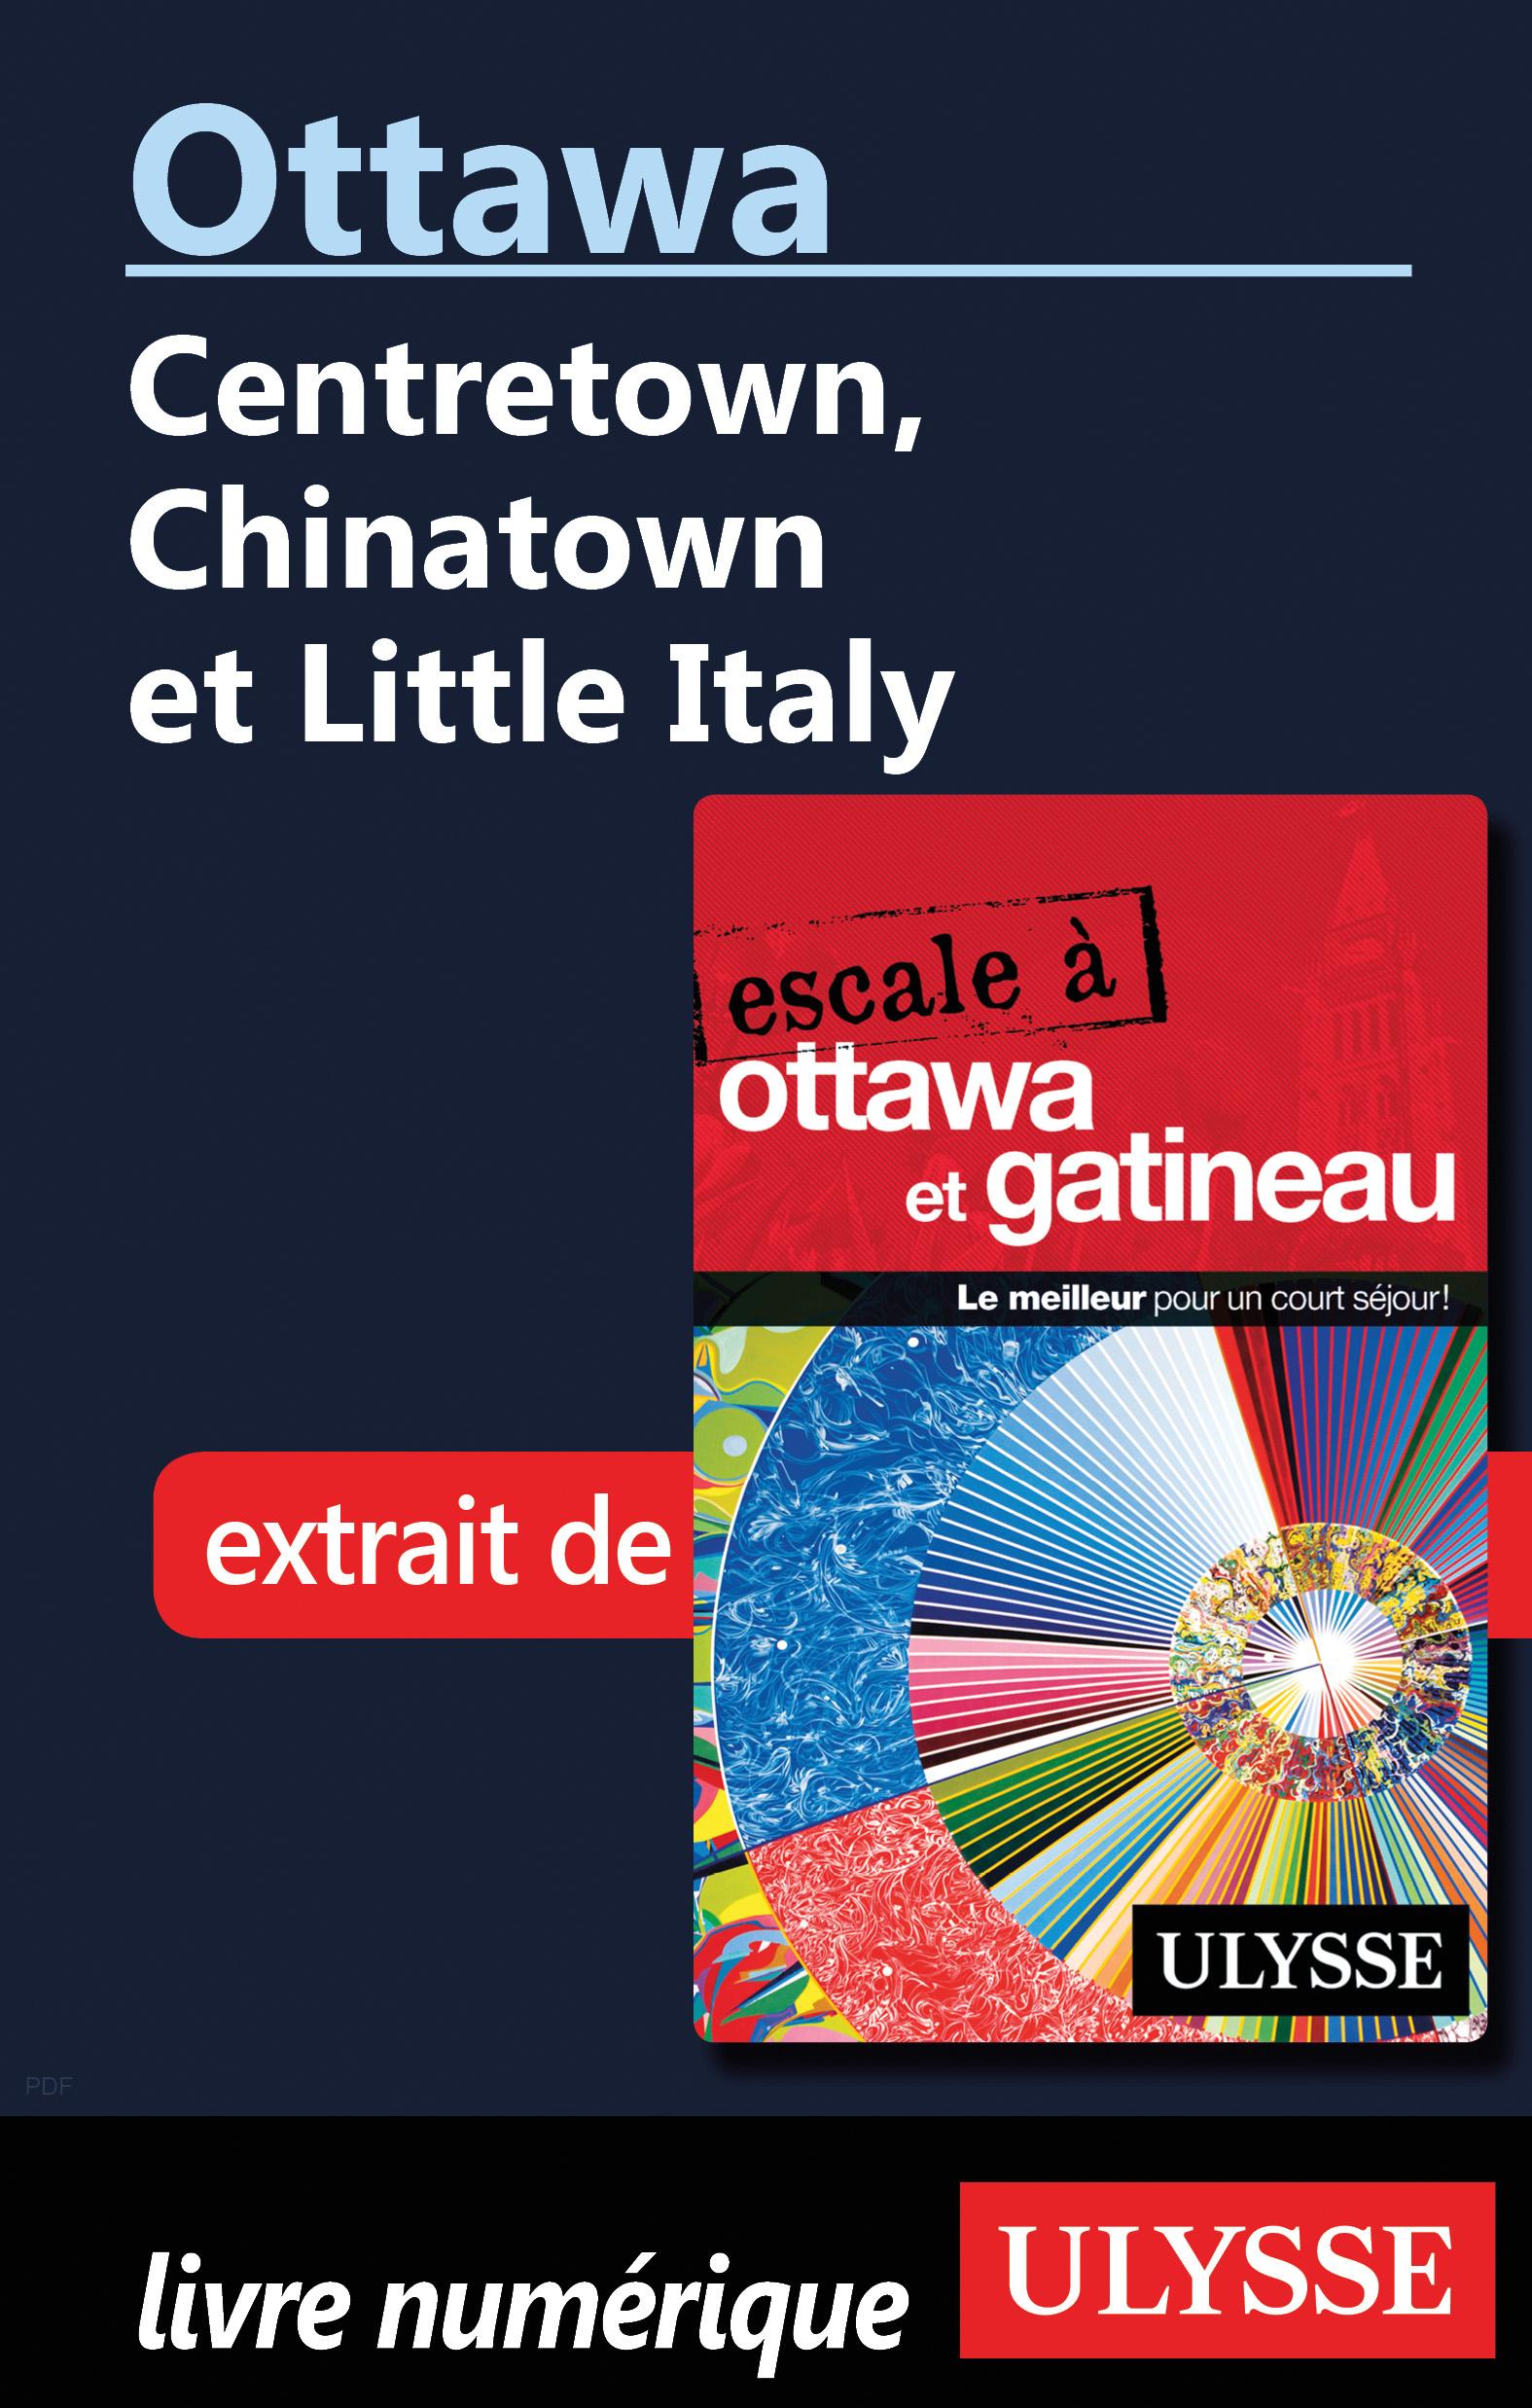 Ottawa: Centretown, Chinatown et Little Italy